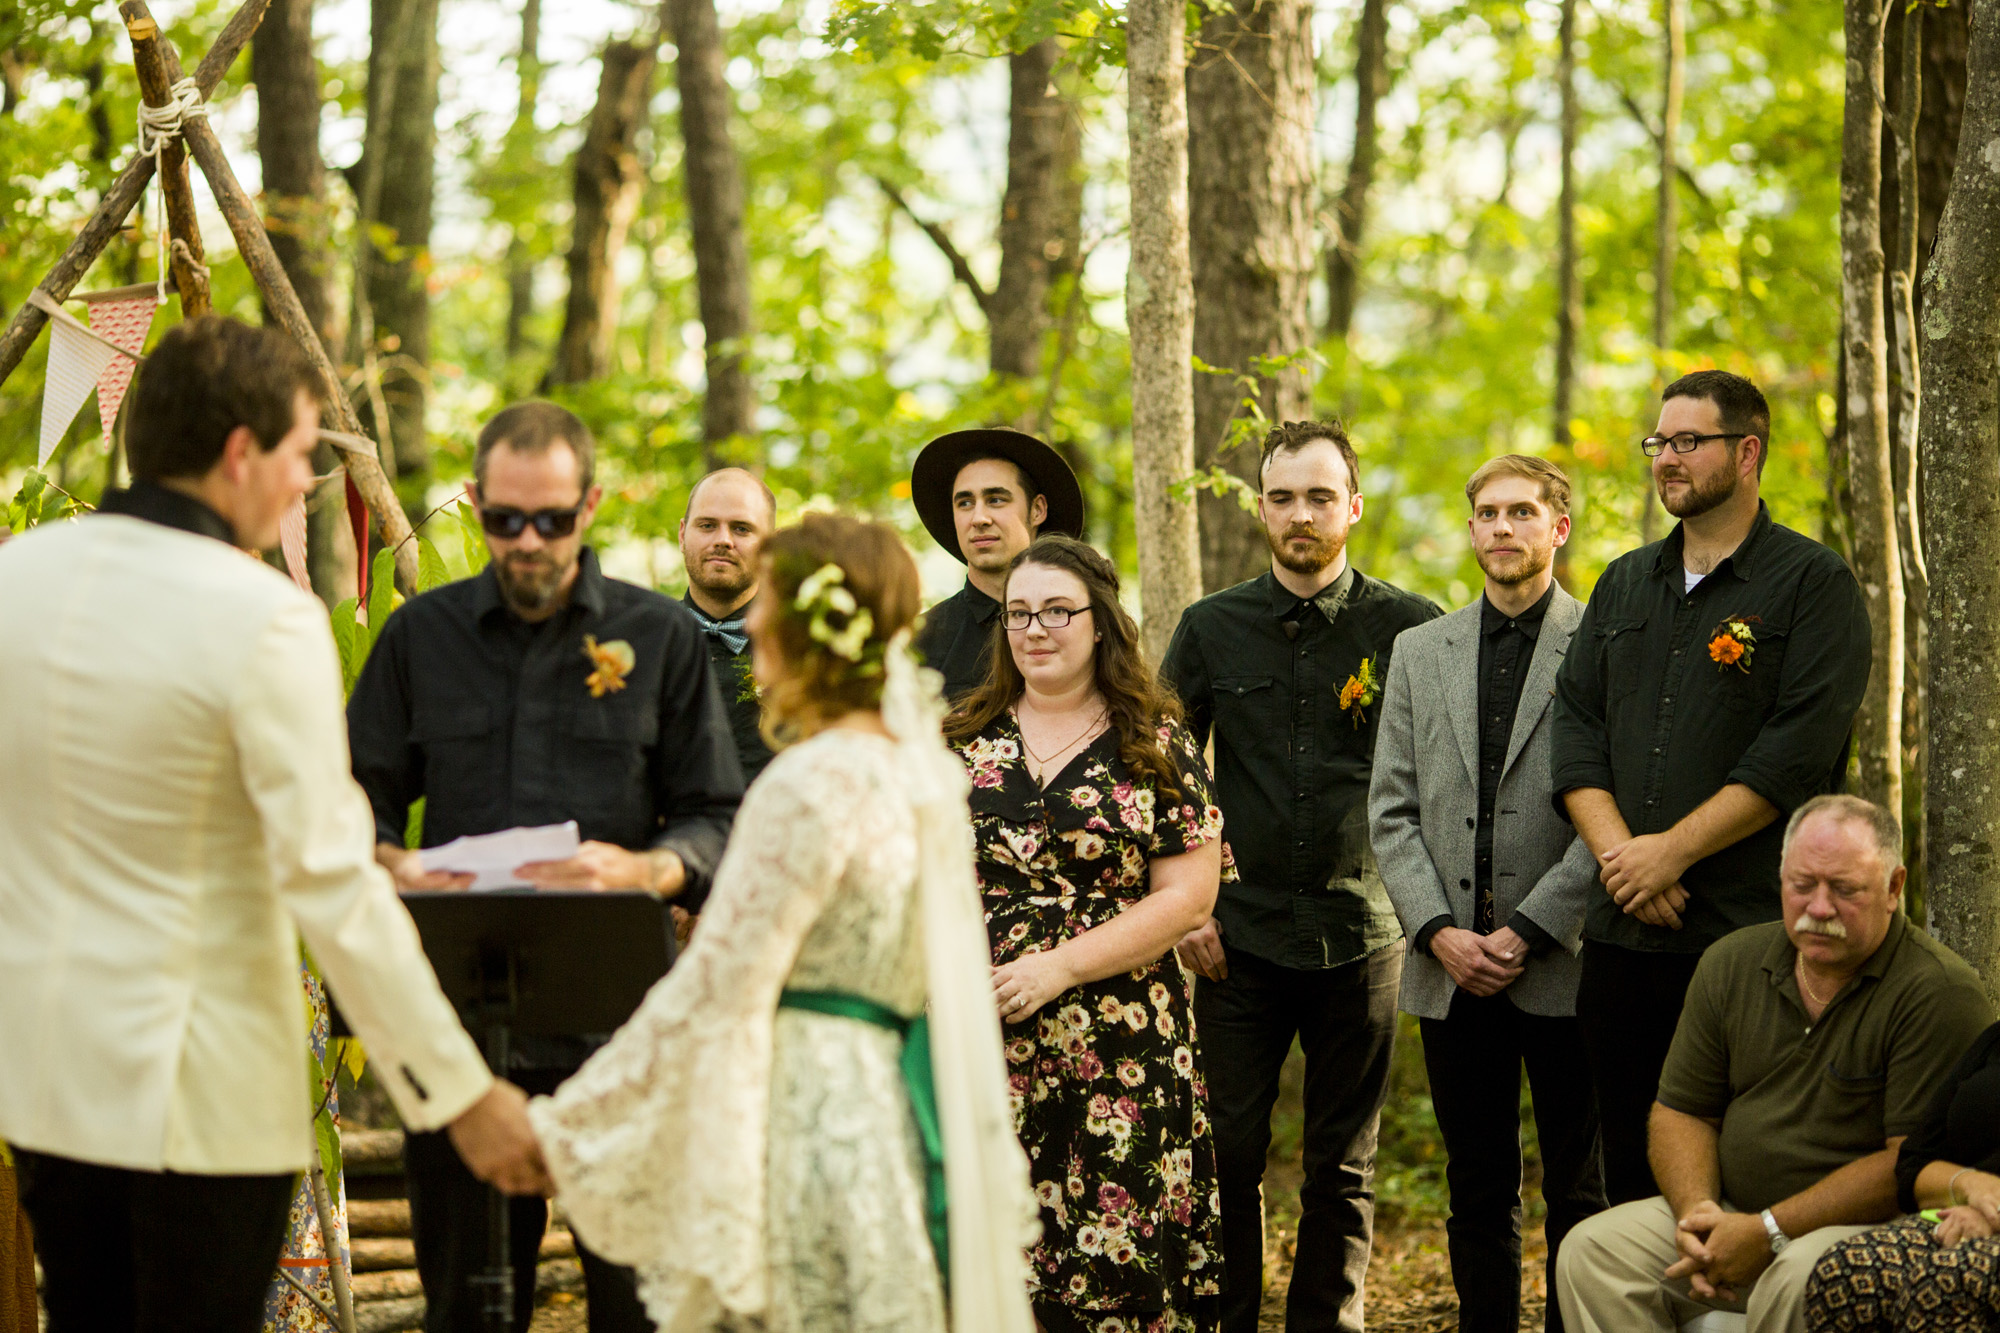 Seriously_Sabrina_Photography_Red_River_Gorge_Kentucky_Wedding_ShawnDana115.jpg